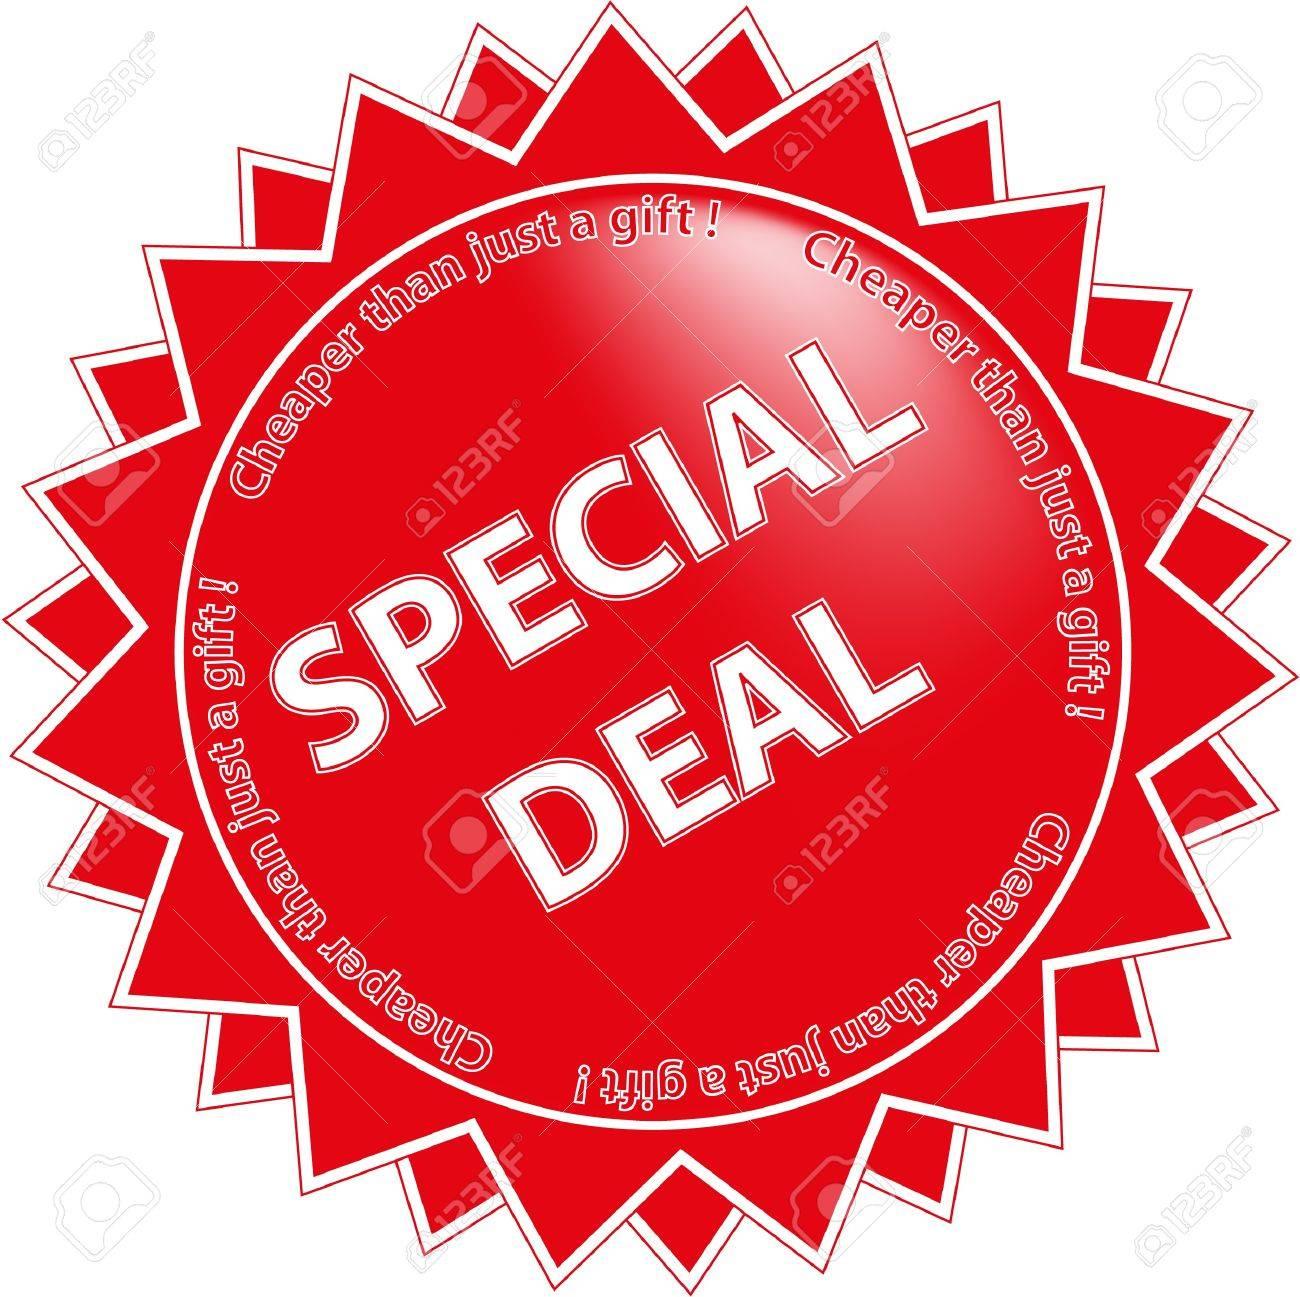 Farouk Harun: Mineral coffee special deal